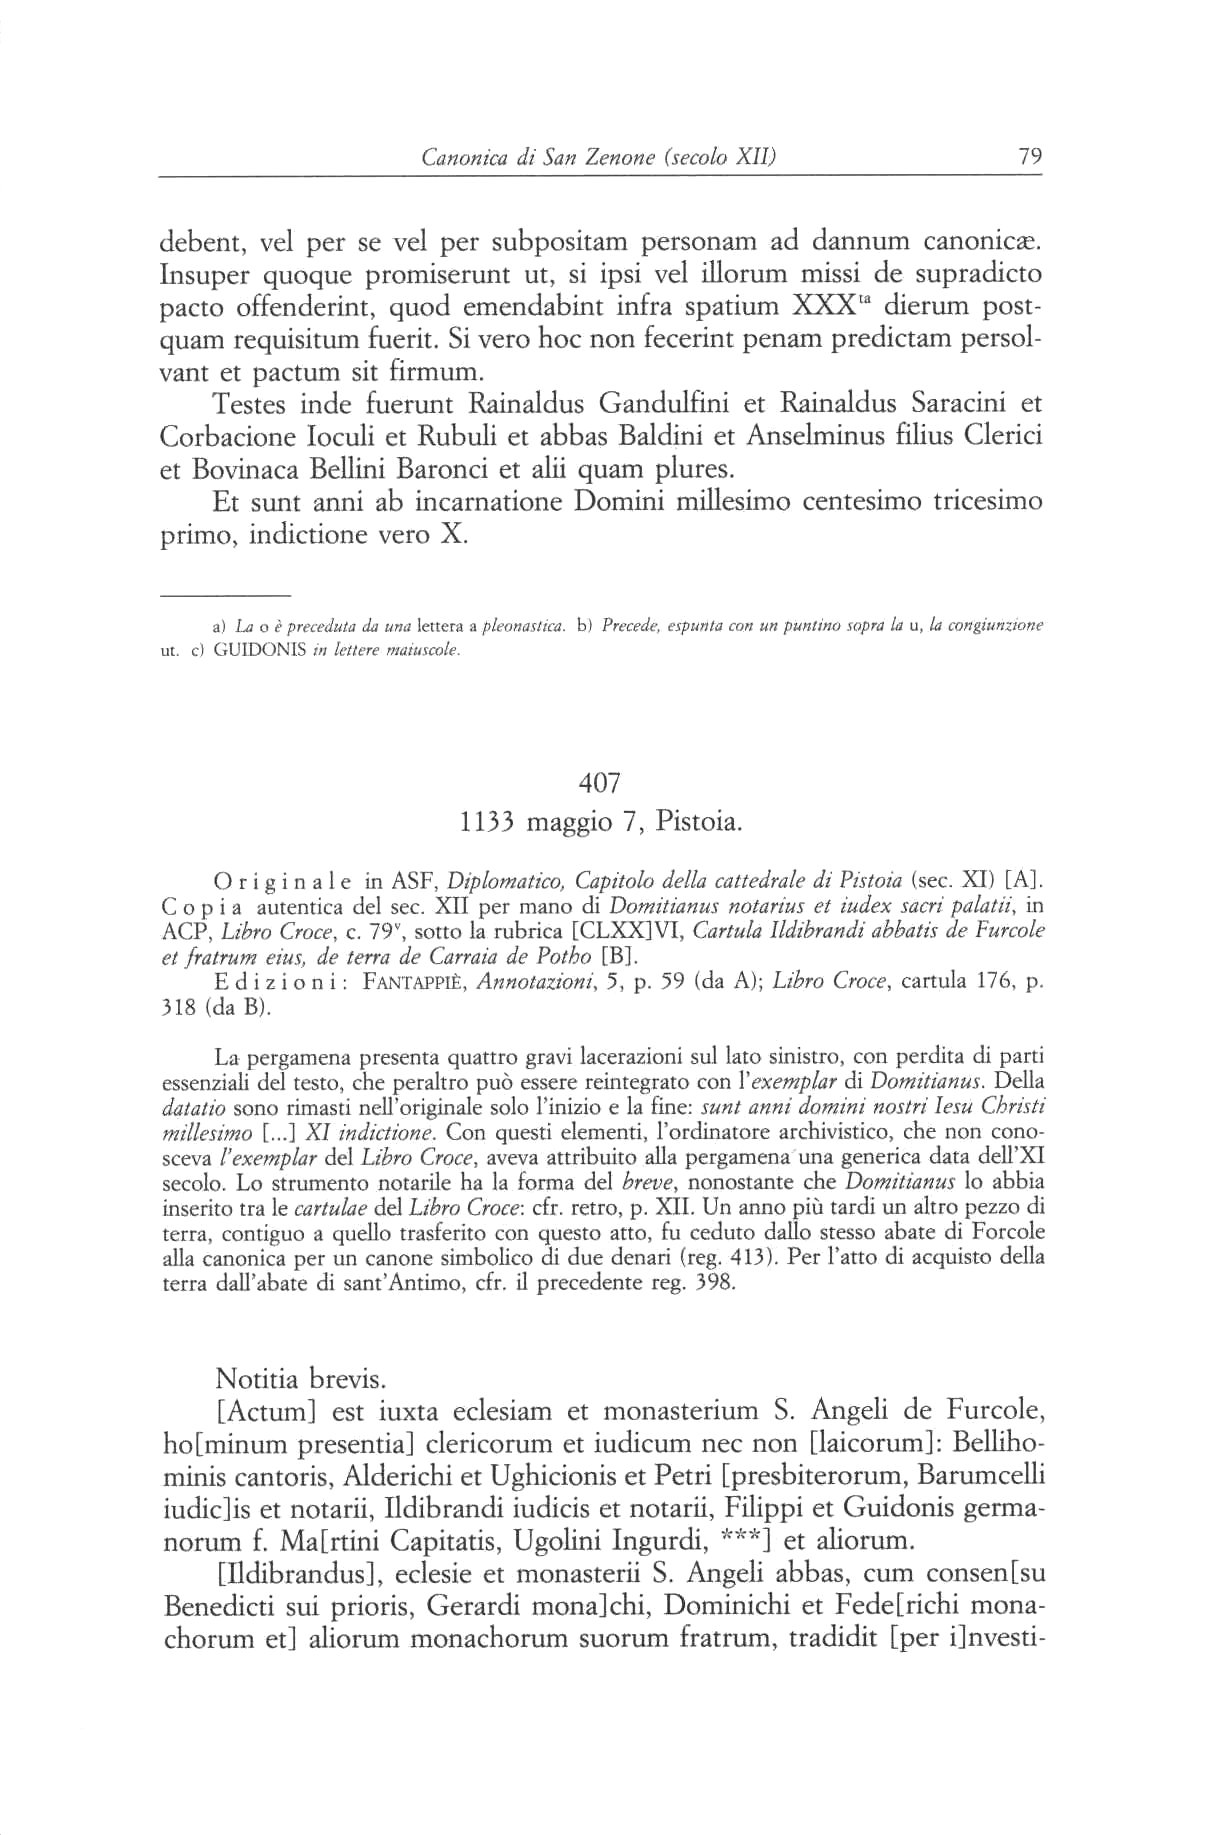 Canonica S. Zenone XII 0079.jpg